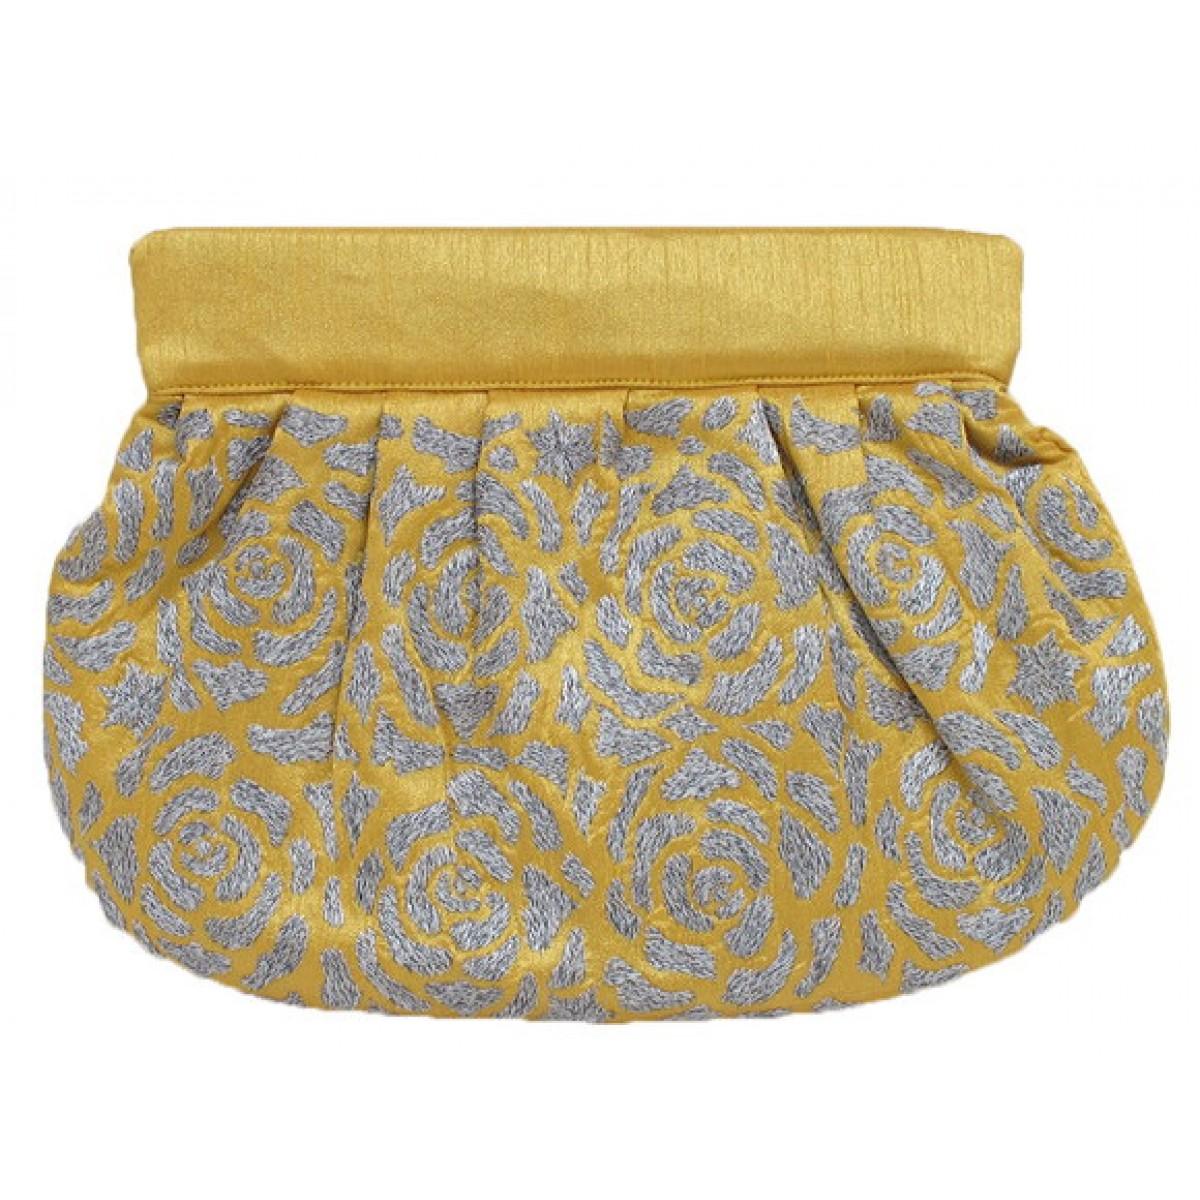 Silk Embroidered Clutch